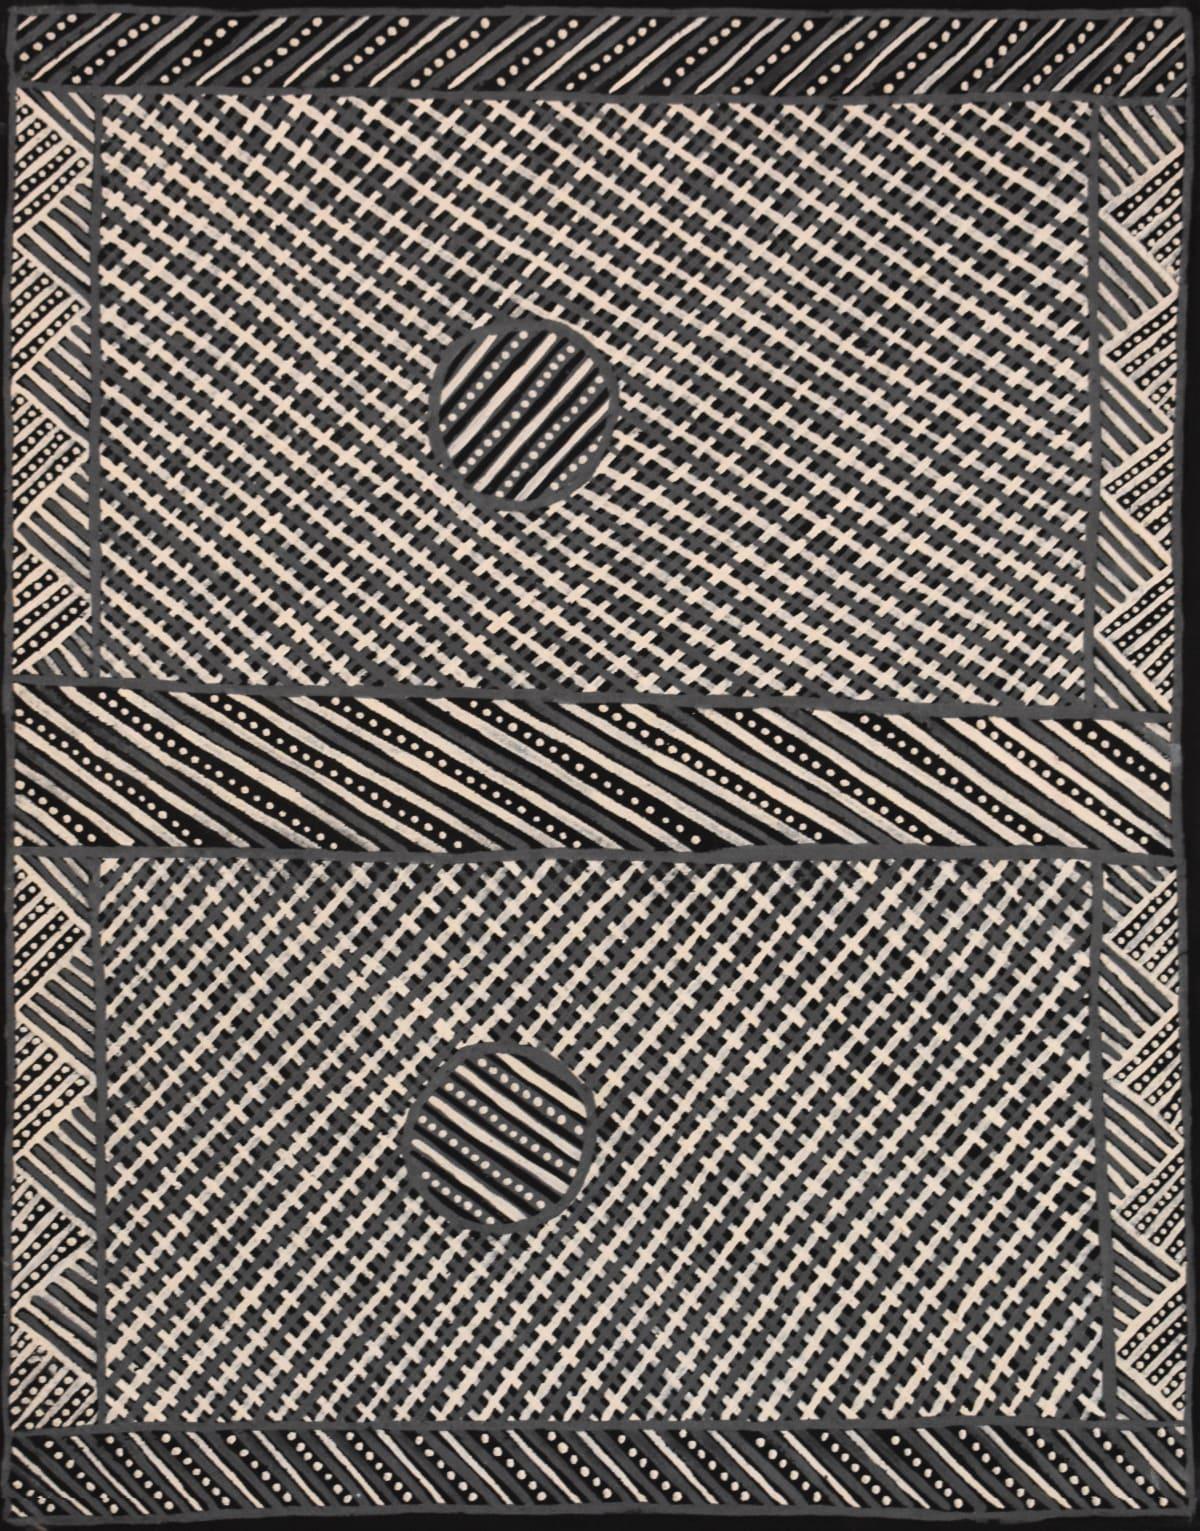 Raymond Bush Jilamara natural ochres on linen 70 x 90 cm